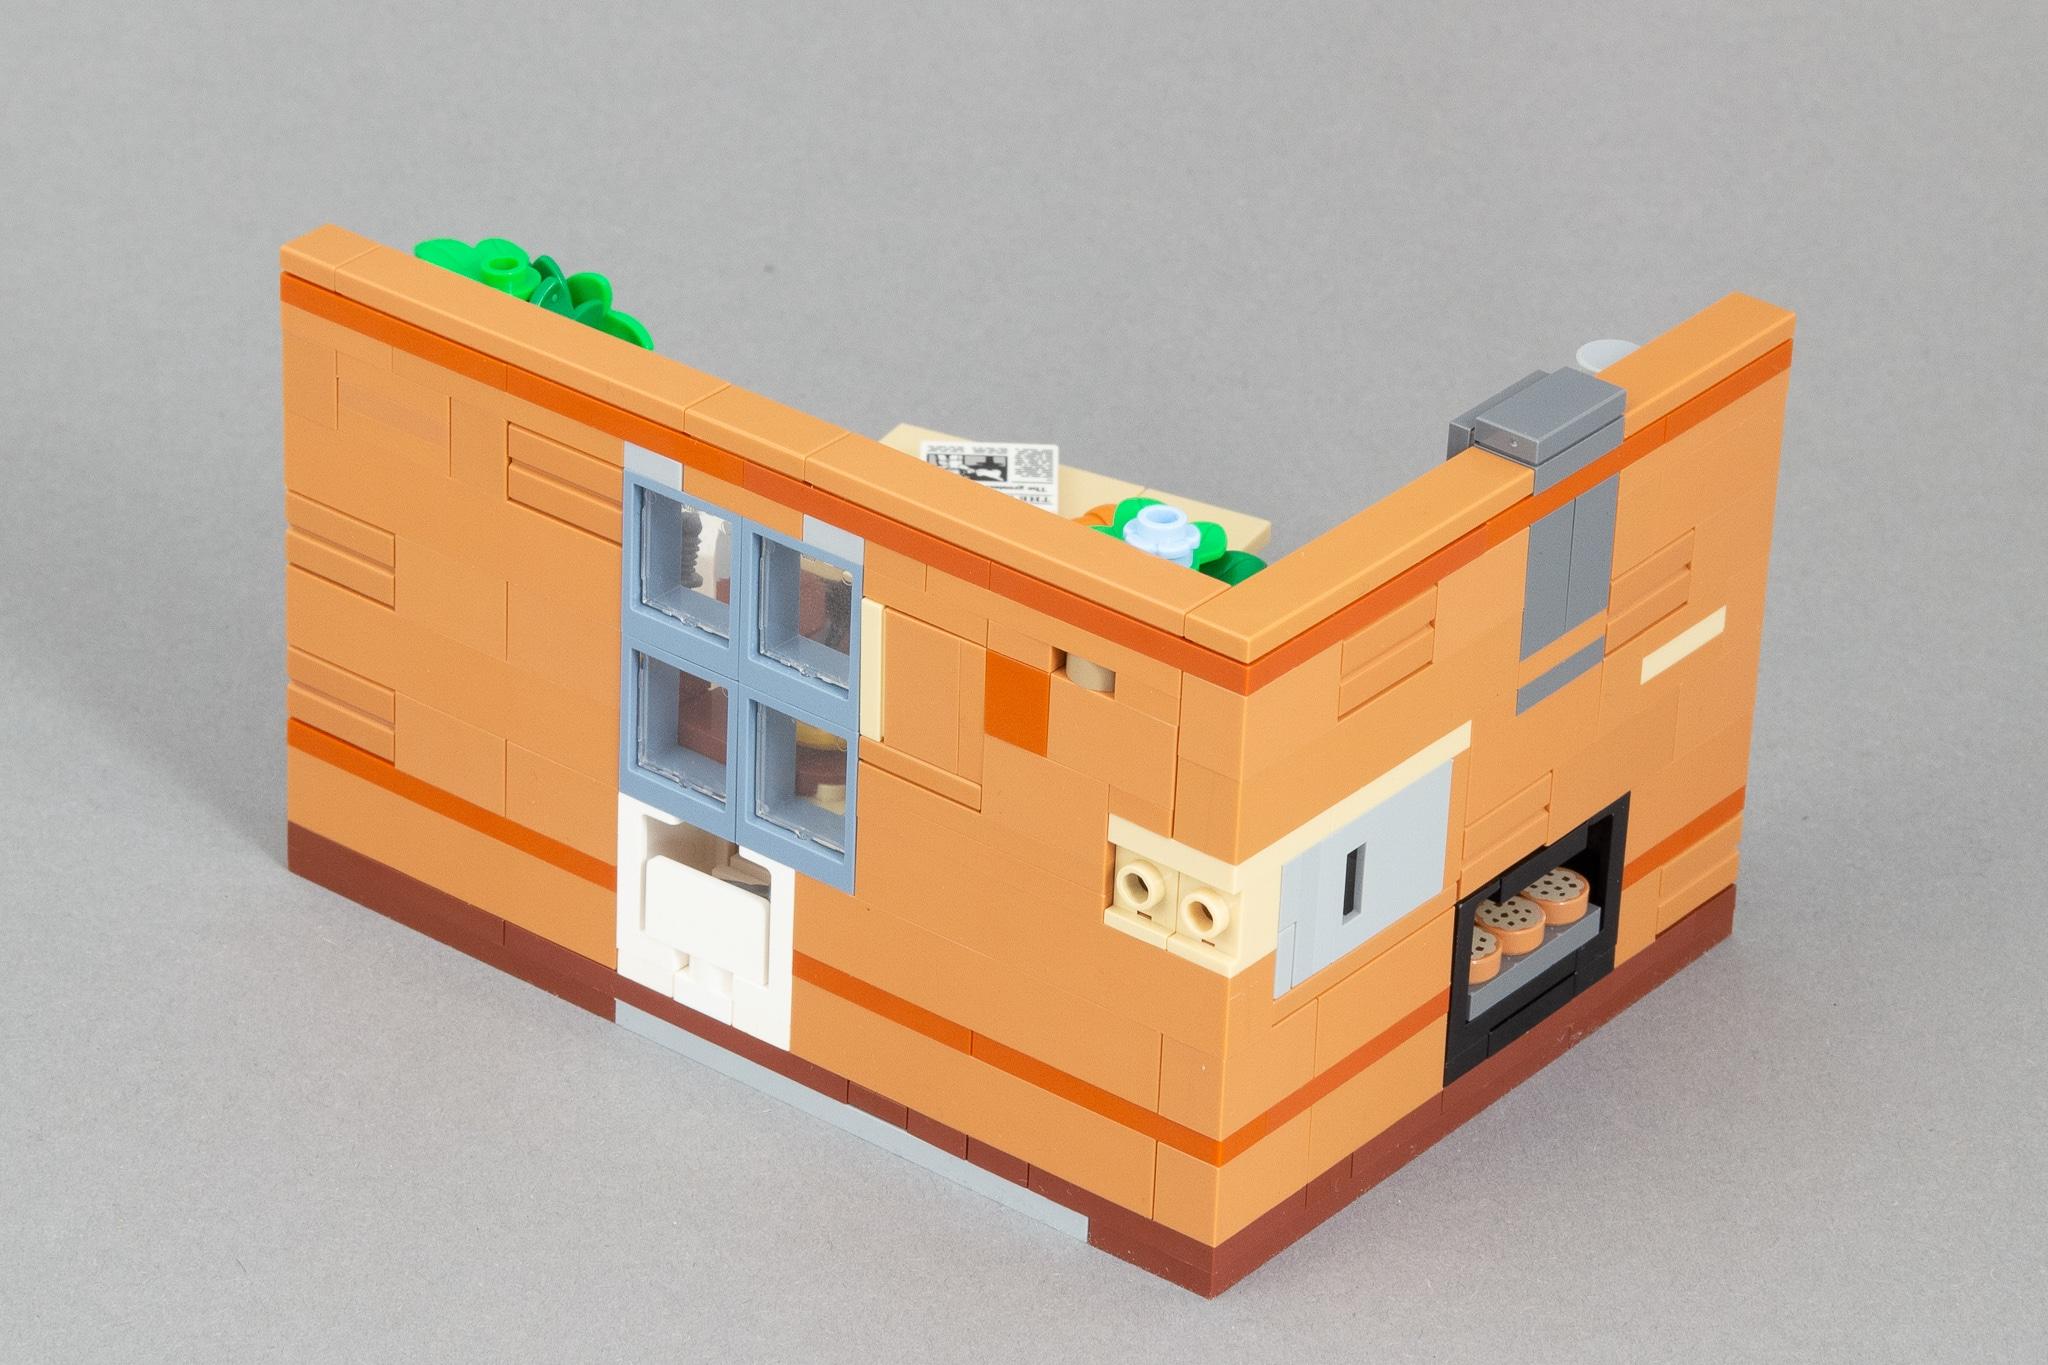 lego-kueche-rueckseite